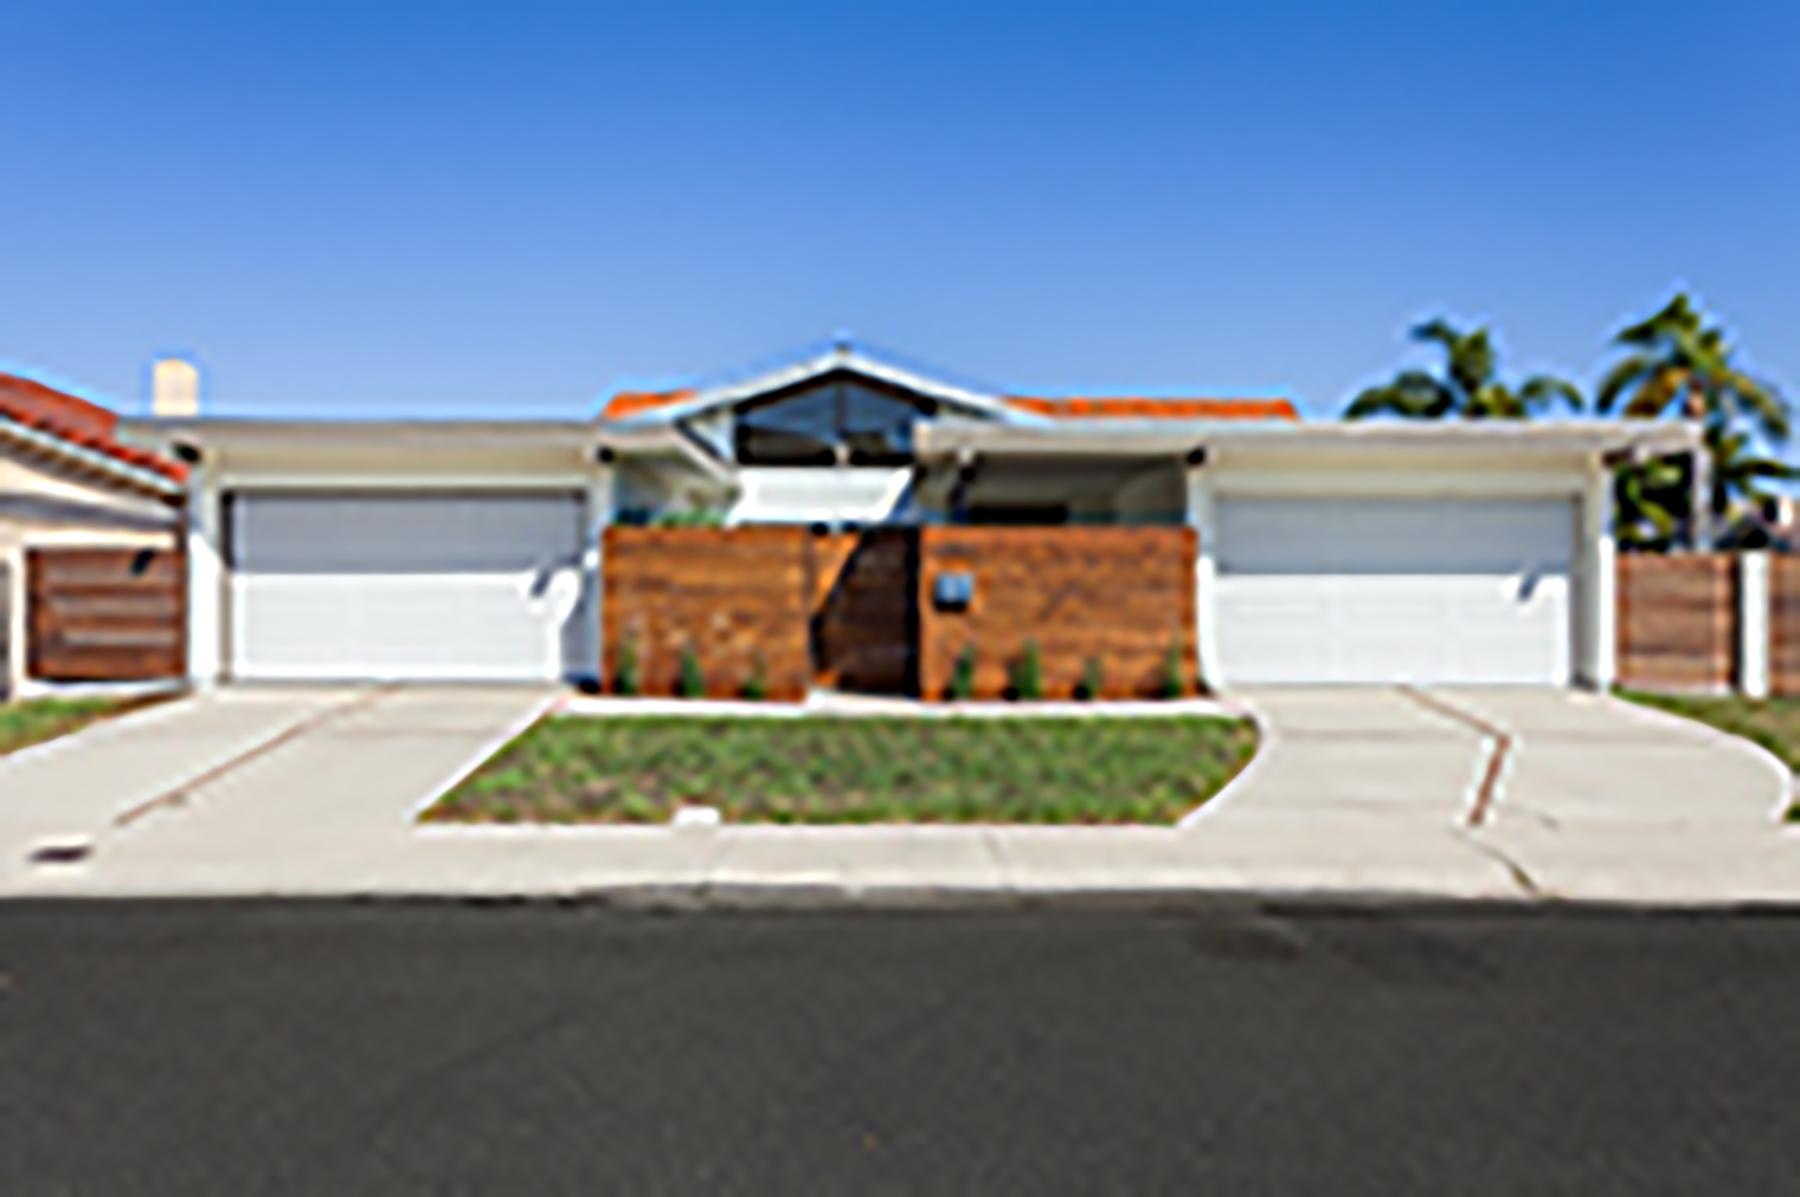 Single Family Home for Sale at 16462 Ladona Cr Huntington Beach, California 92649 United States